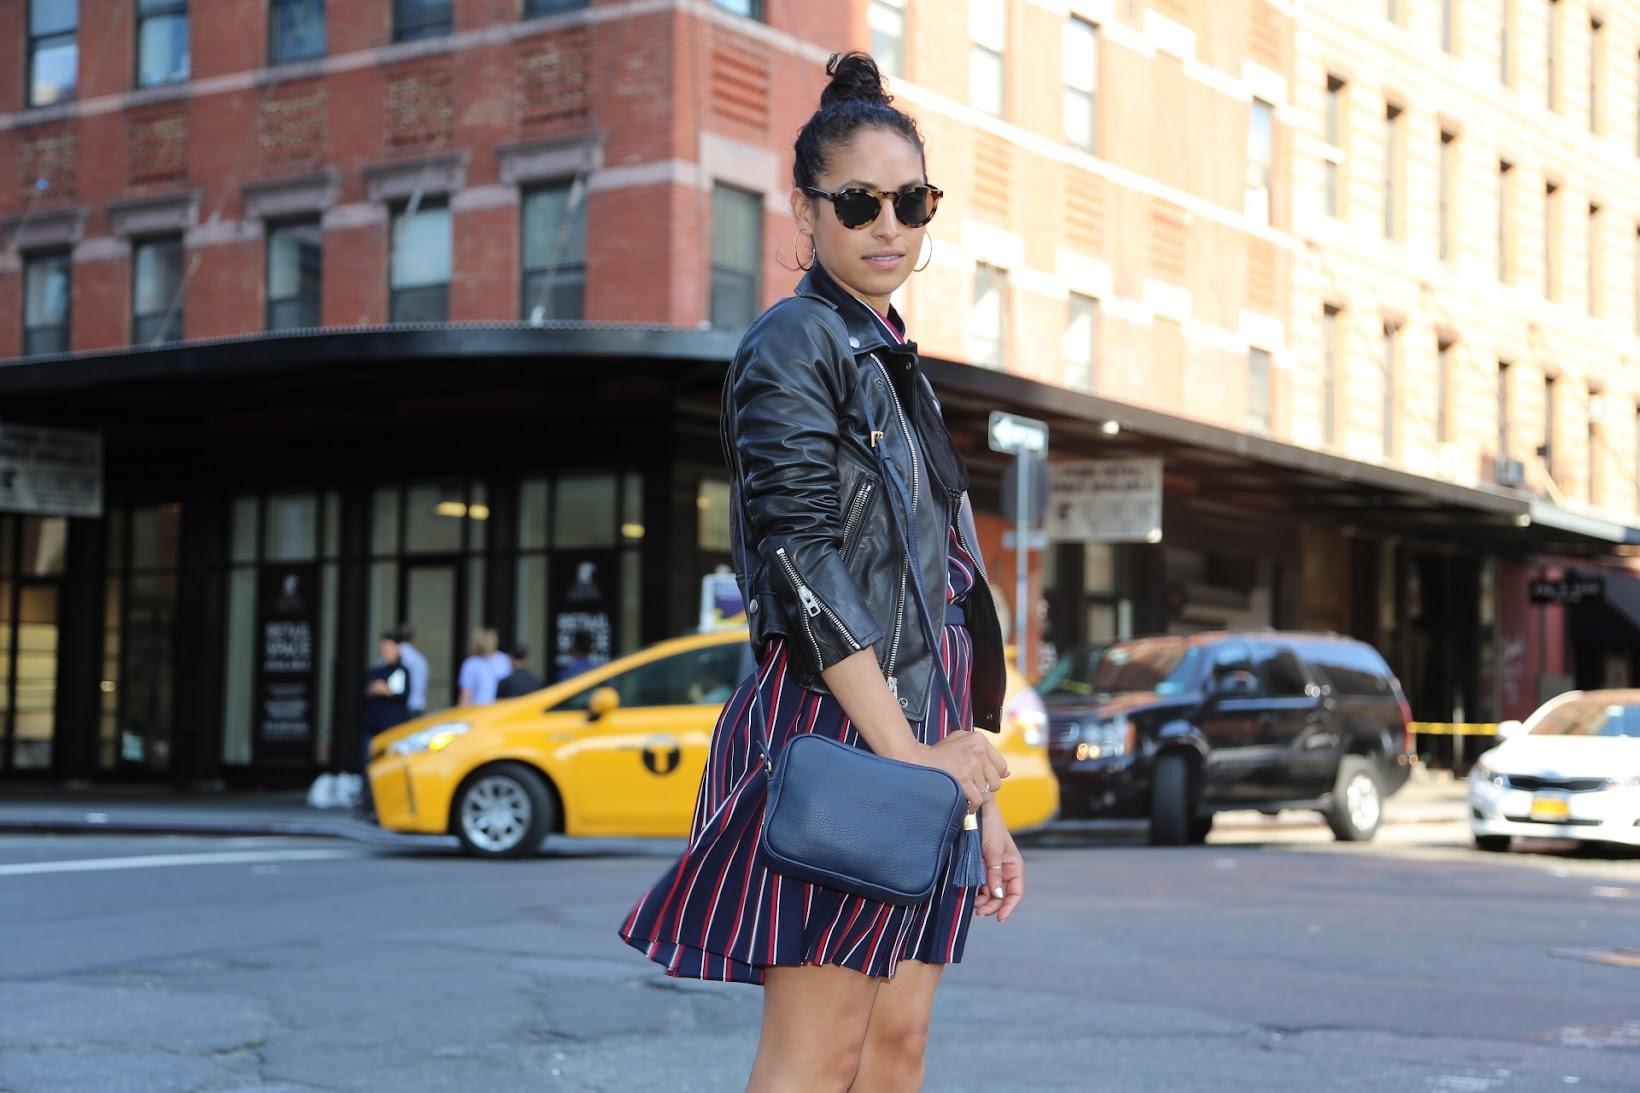 NYFW, NYC, all stripes, Banana Republic, It's Banana, stripes, Fall fashion, fall outfit, Gigi New york, hoop earrings, Frye harness boots